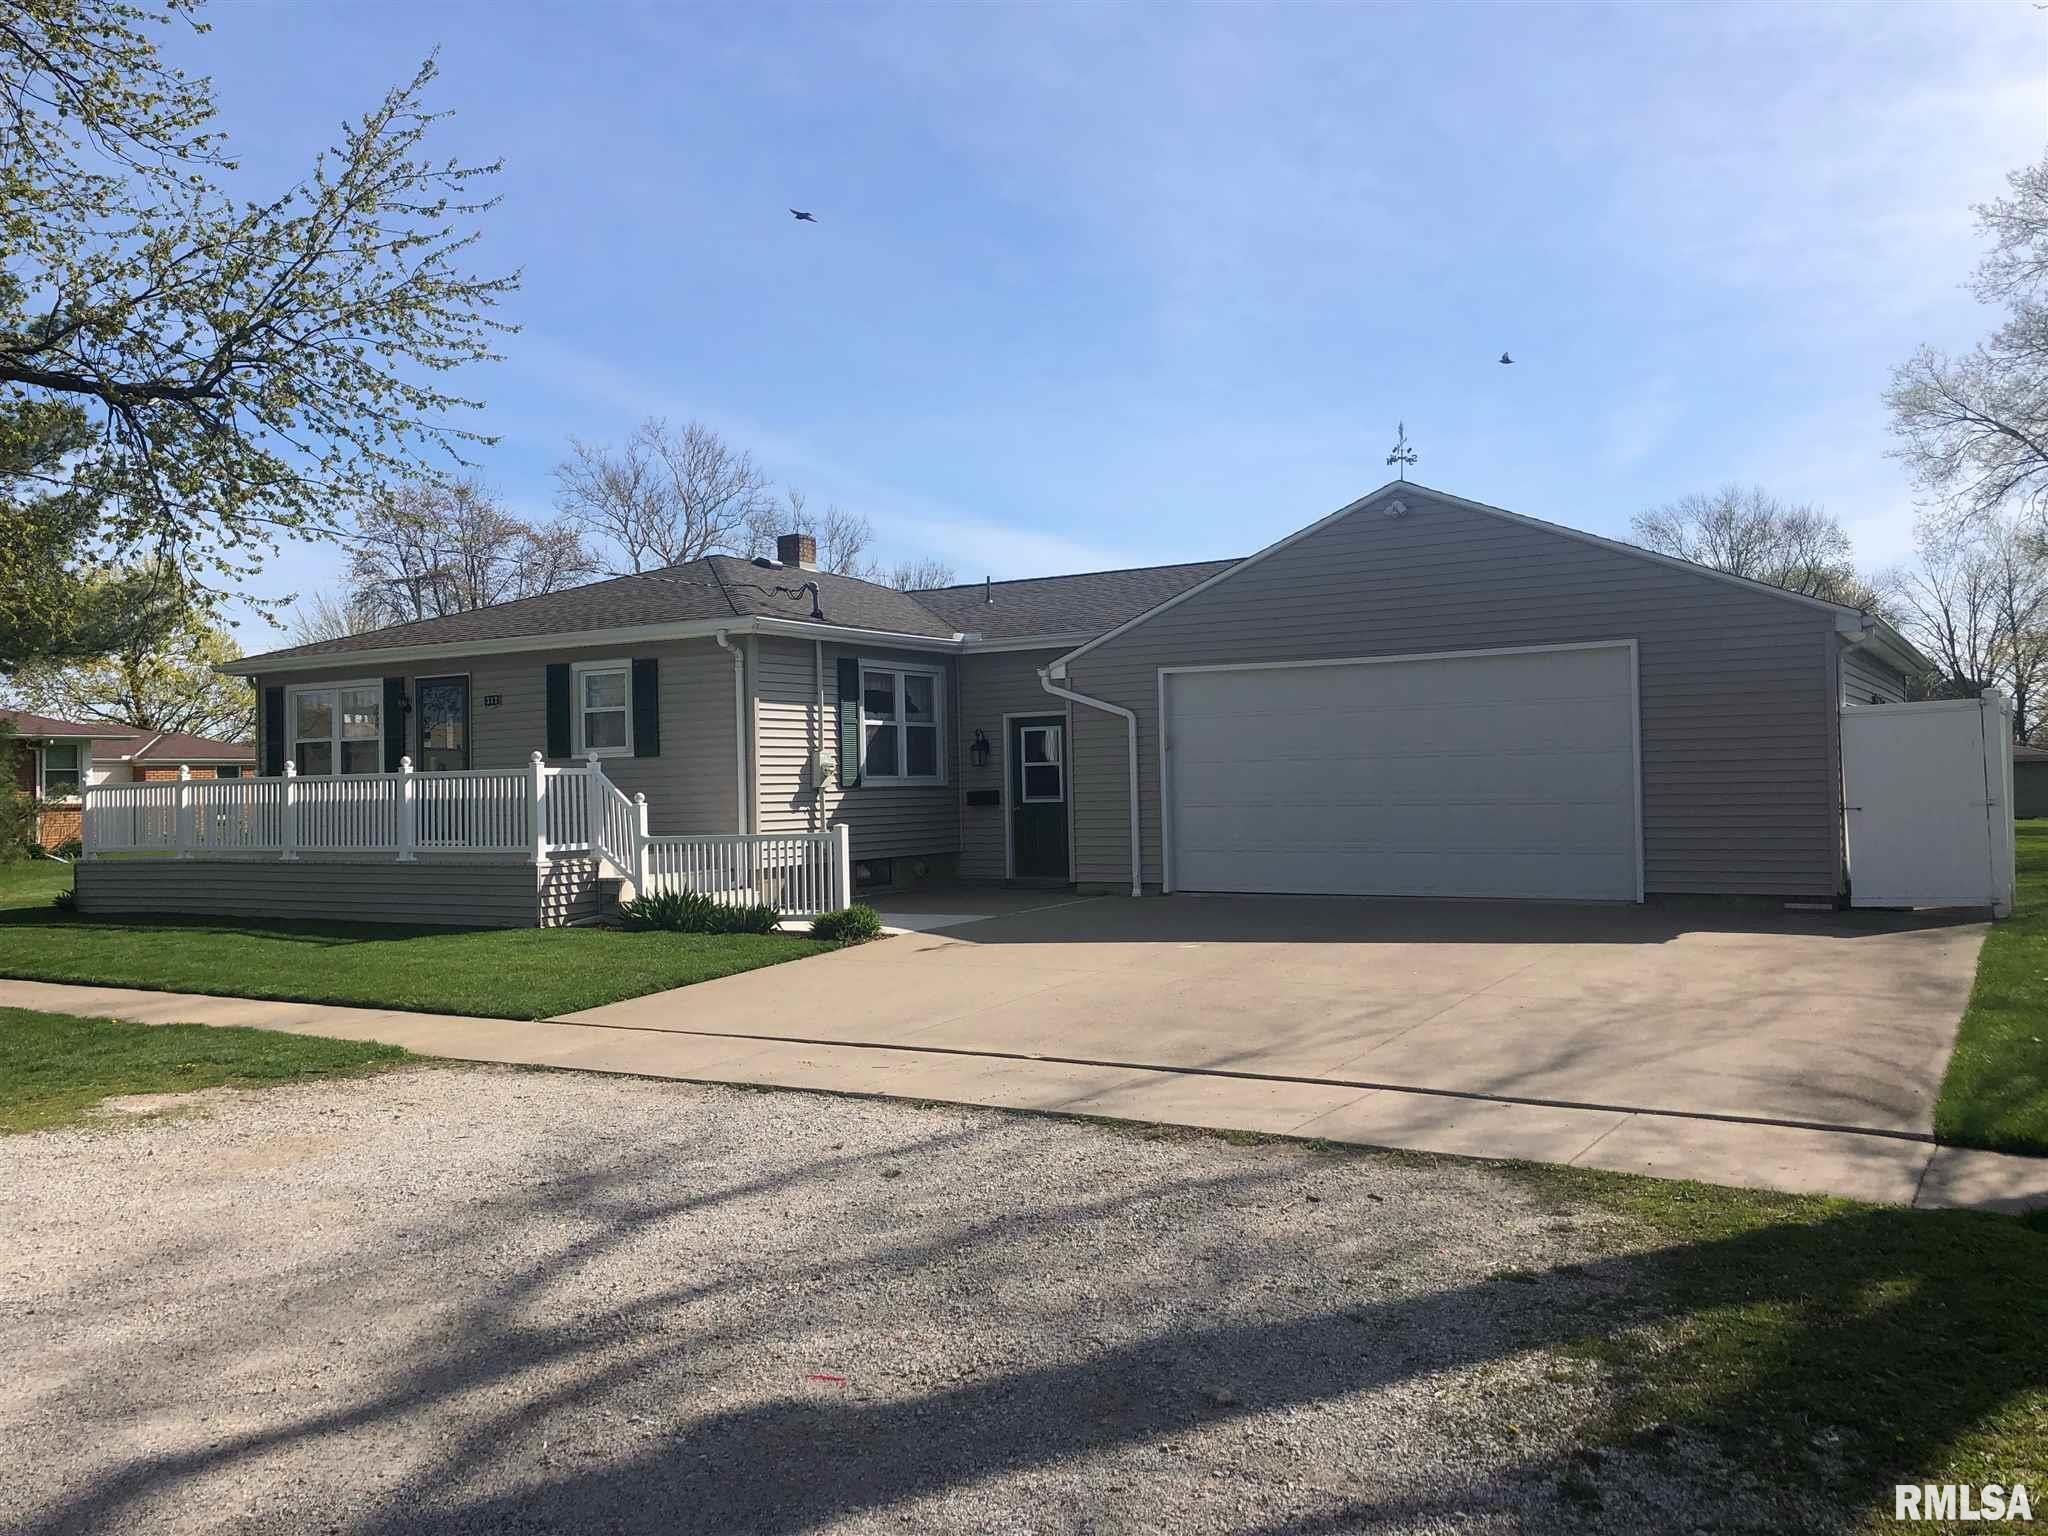 312 N SPRING Property Photo - Metamora, IL real estate listing